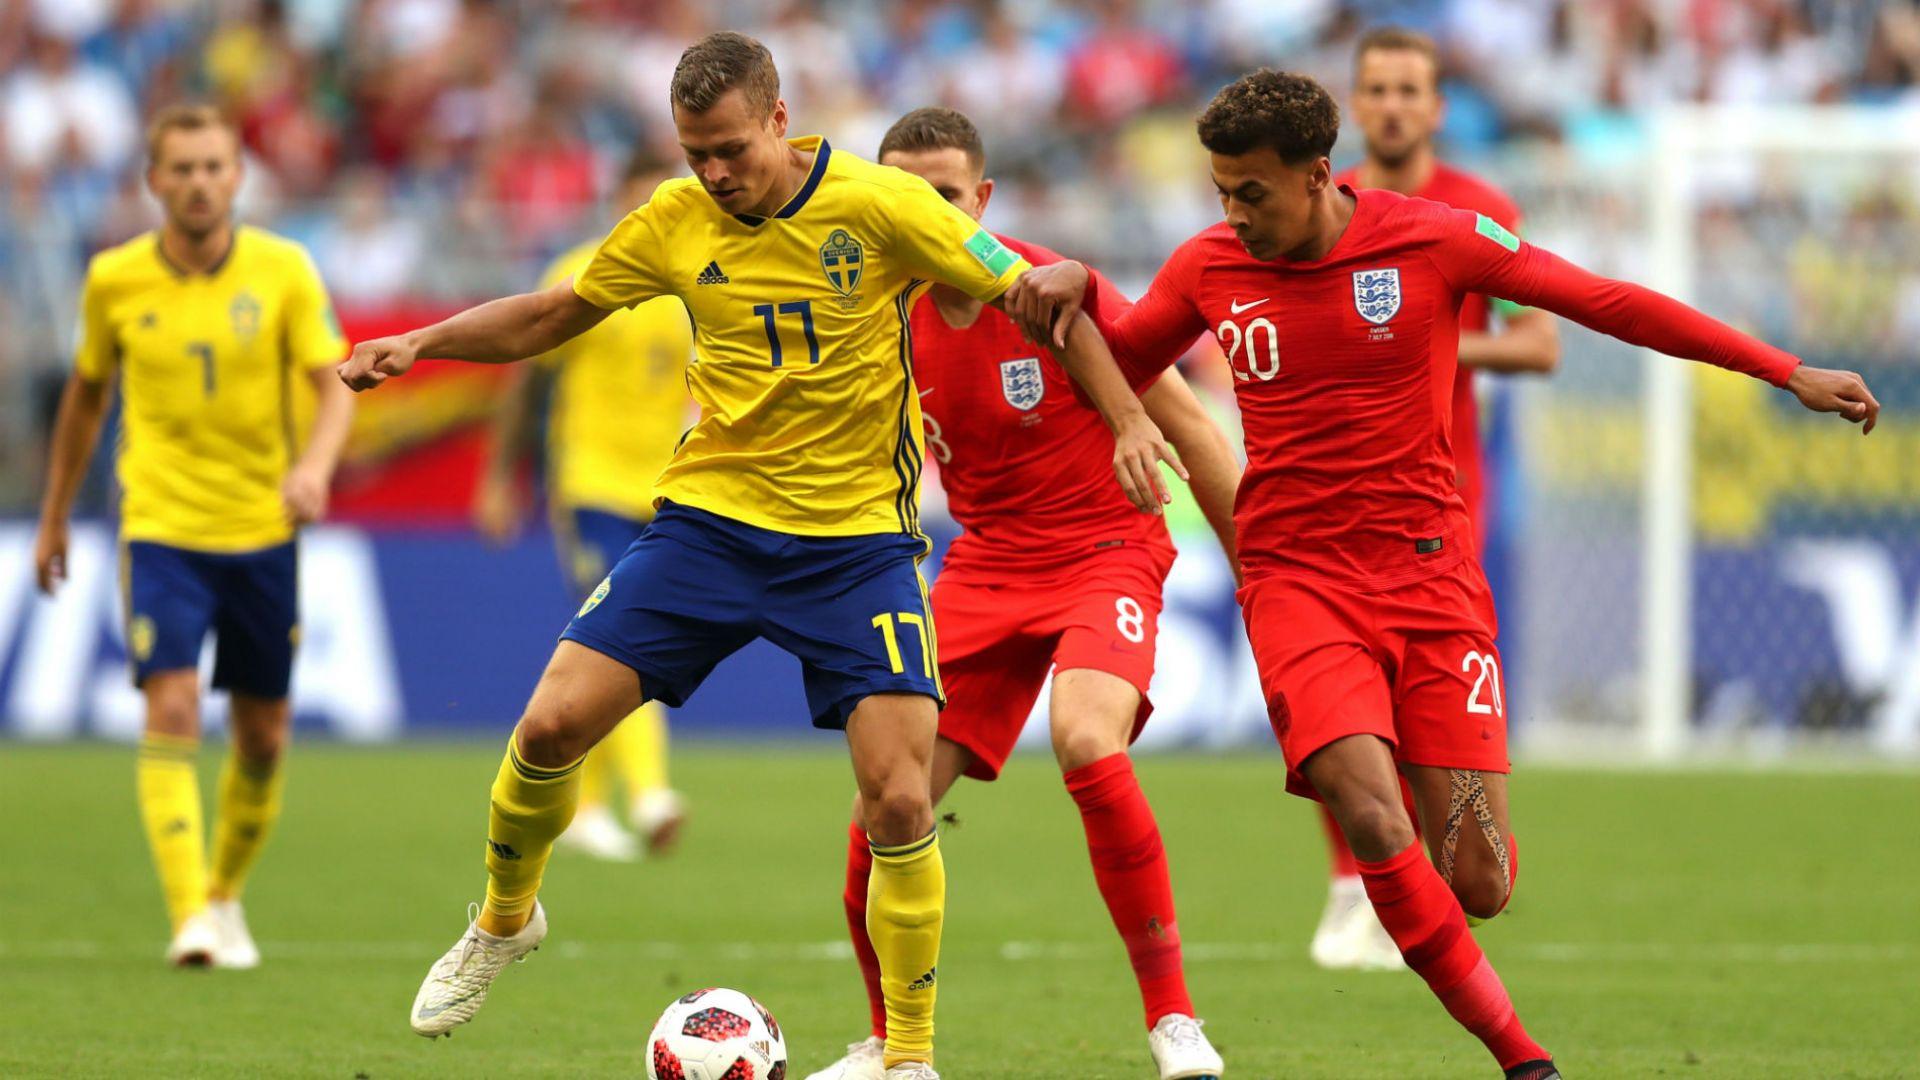 Швеция - Англия 0:2 (статистика)